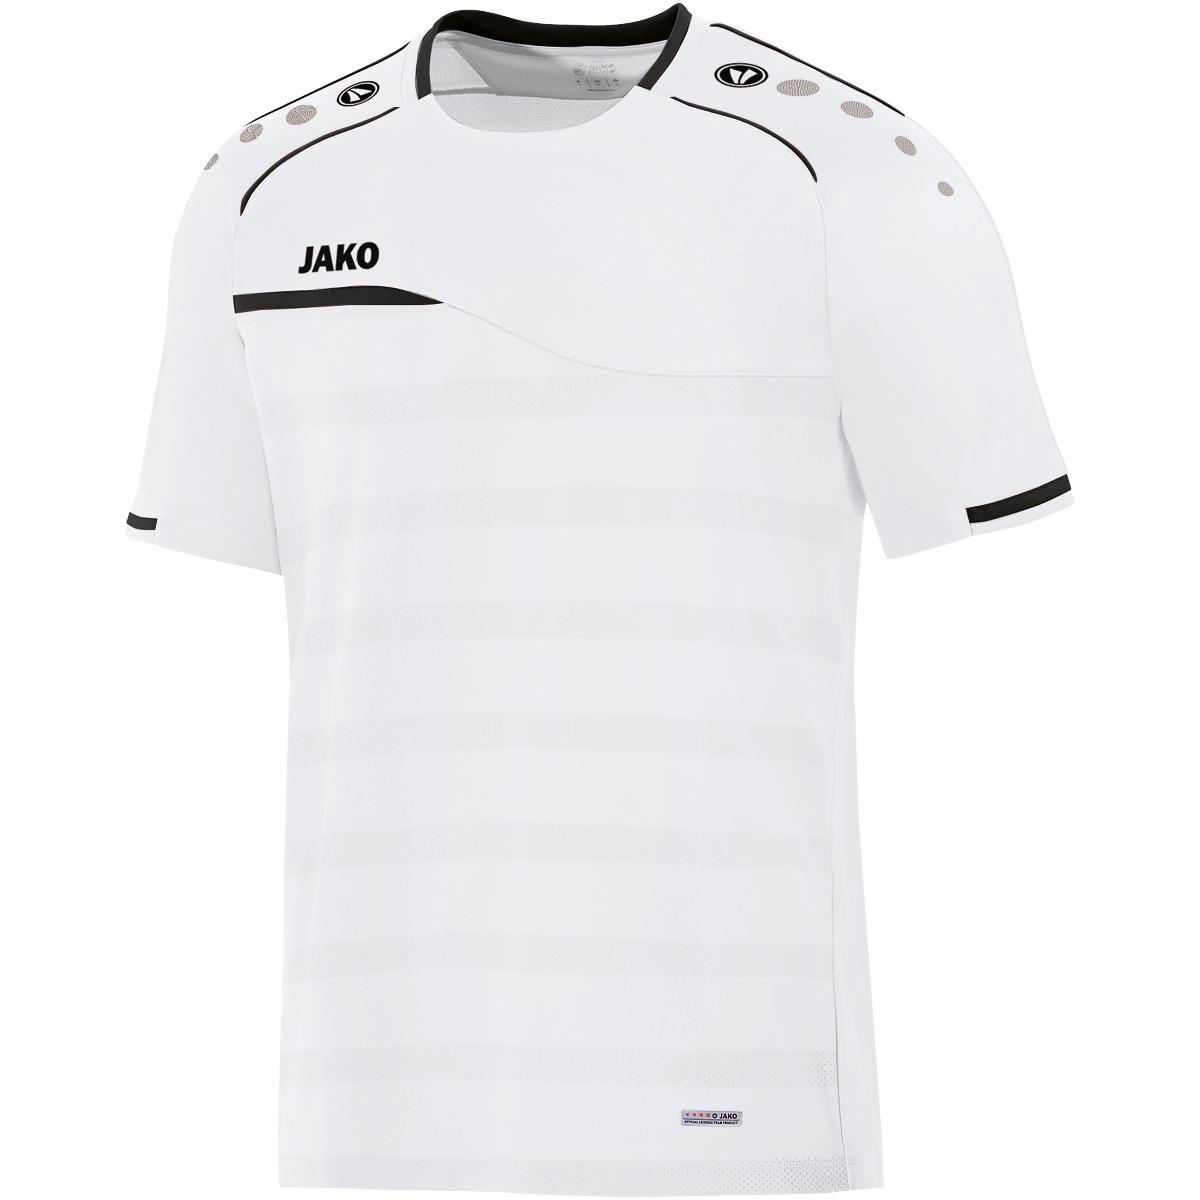 100% echt konkurrenzfähiger Preis überlegene Materialien T-Shirt Prestige   jako.de